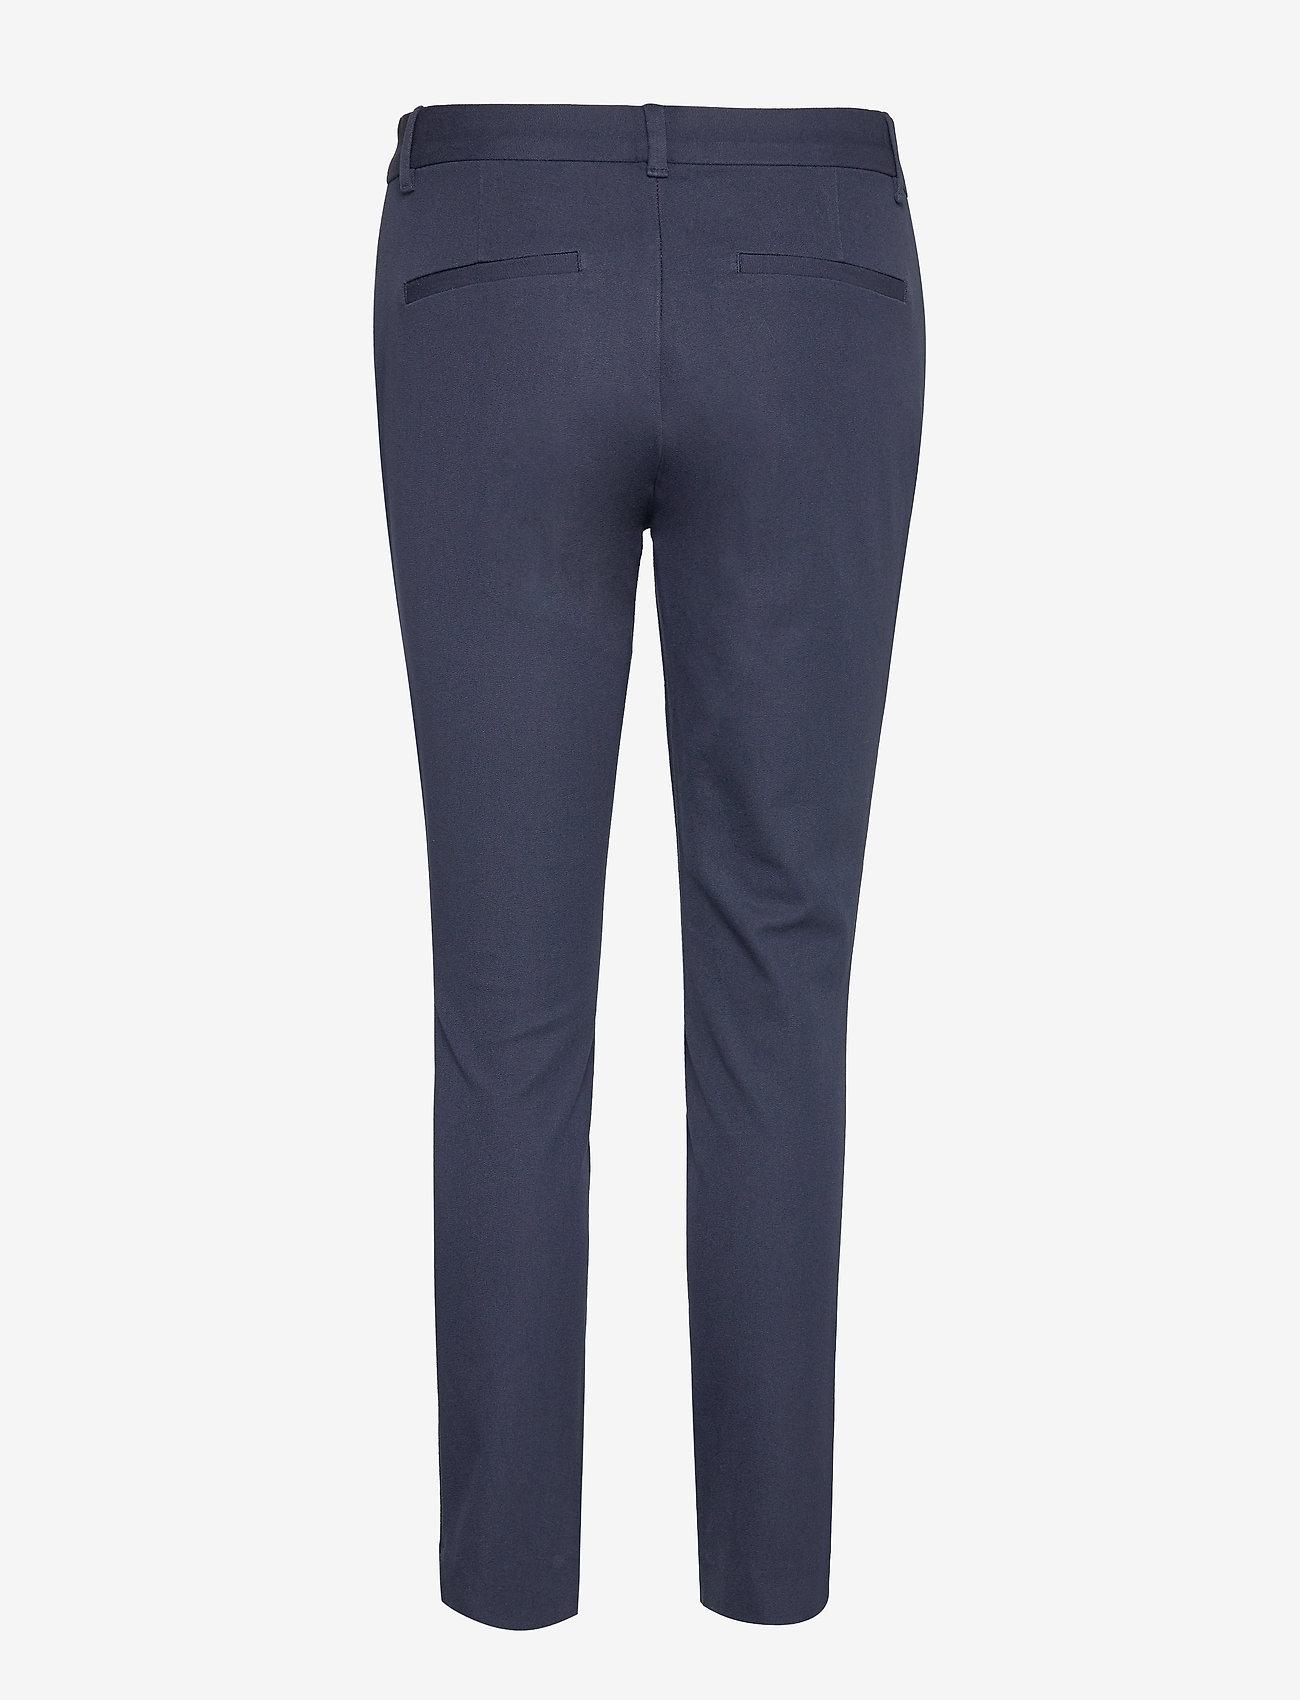 GAP V-SKINNY ANKLE BISTRETCH- Pantalons jhYUpHZW dyafq tQEiNjsi